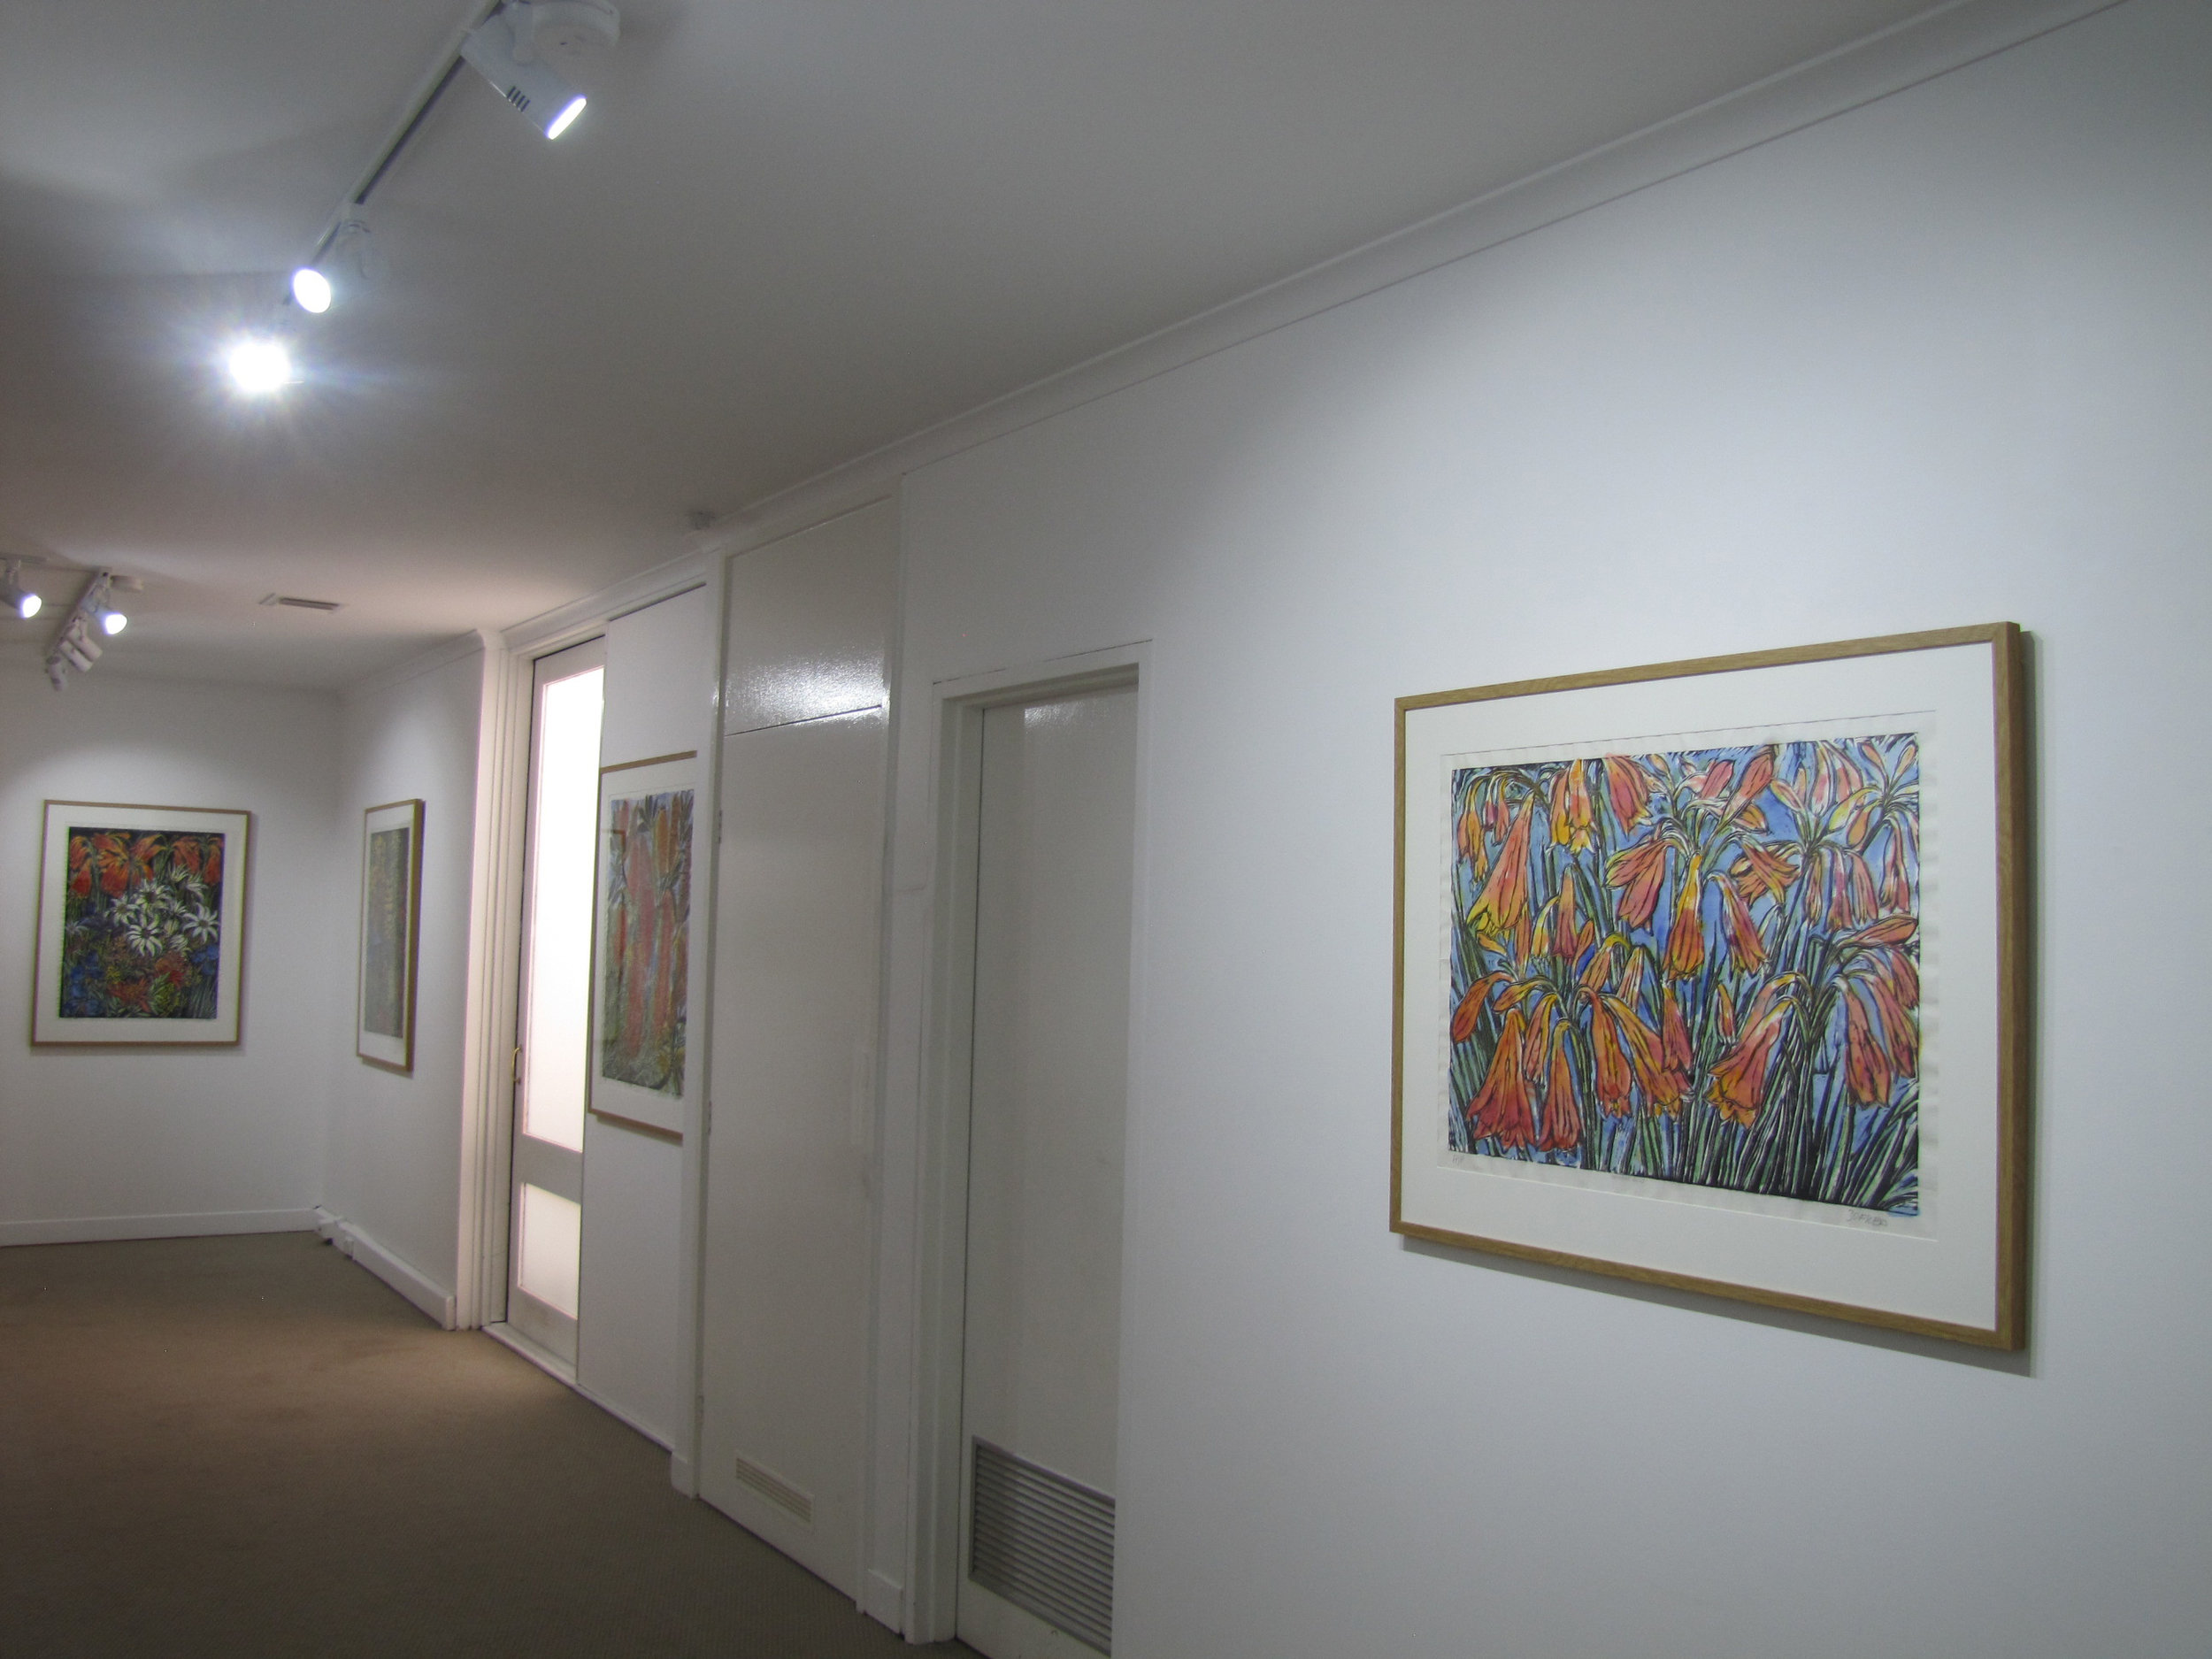 NSG. Zofrea exhibition. Exhibition view 10.jpg